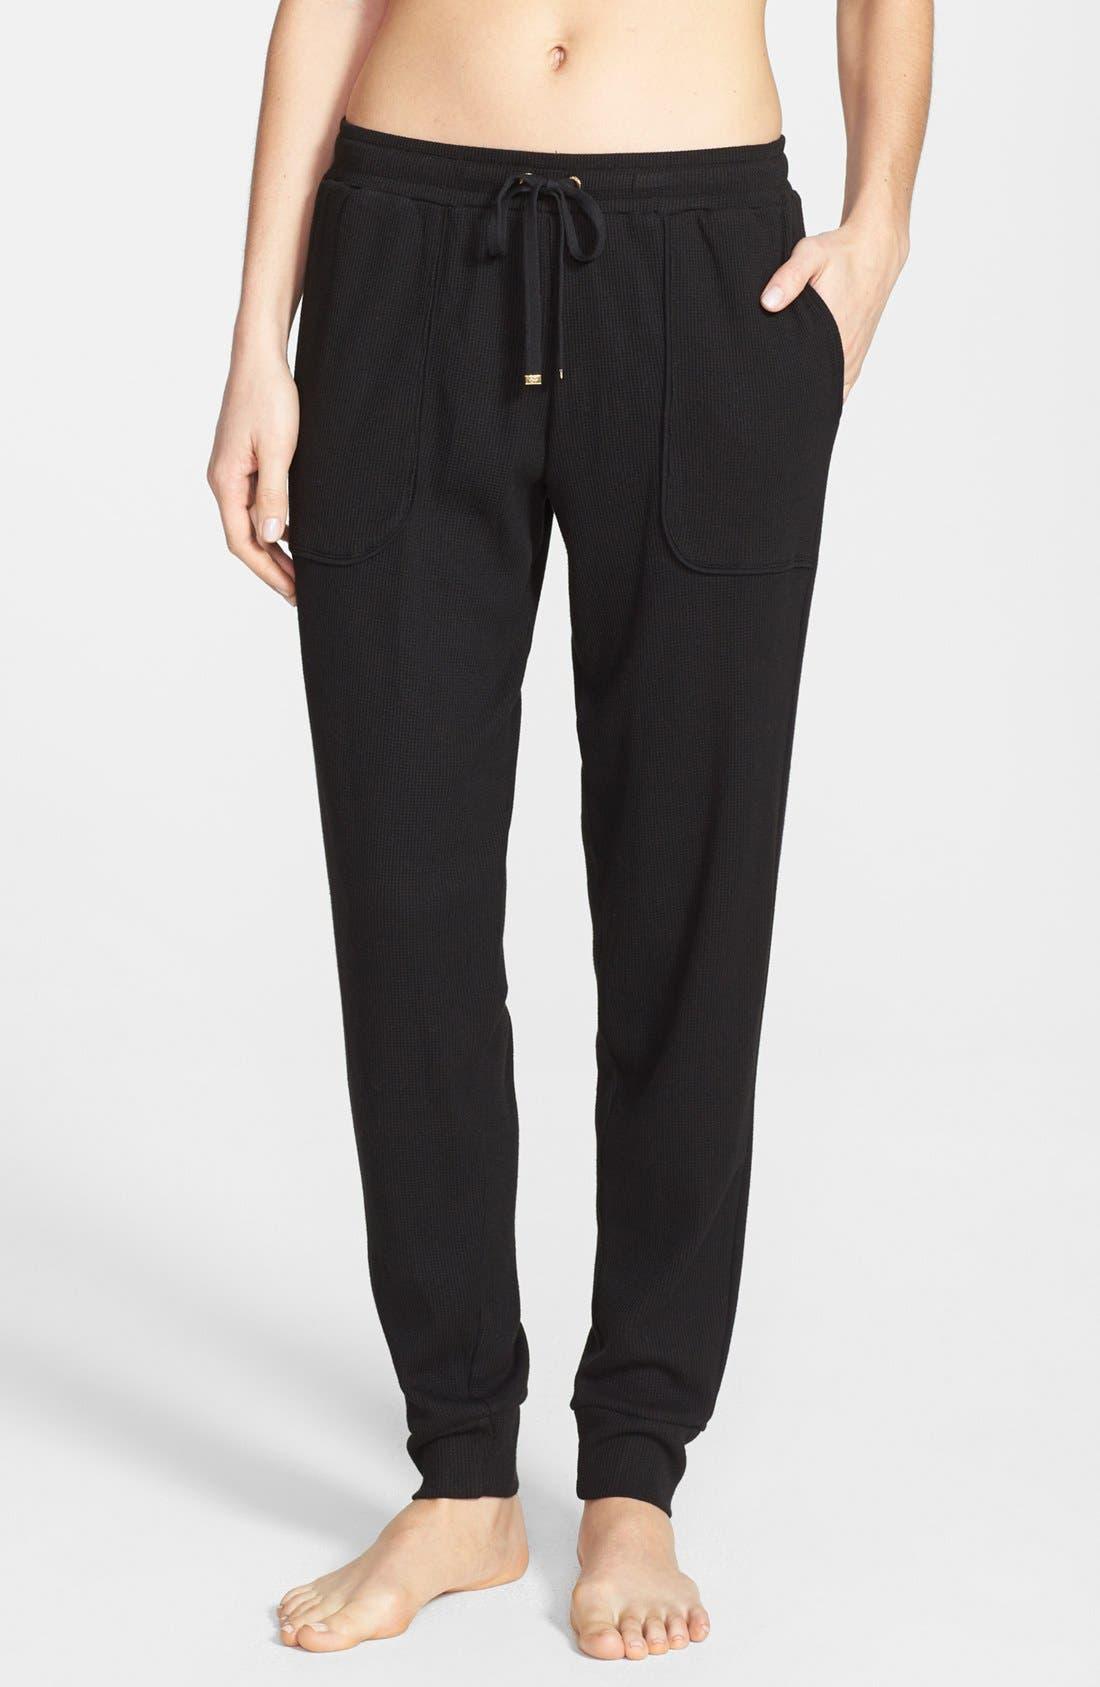 Main Image - DKNY 'Leisure Class' Sweatpants